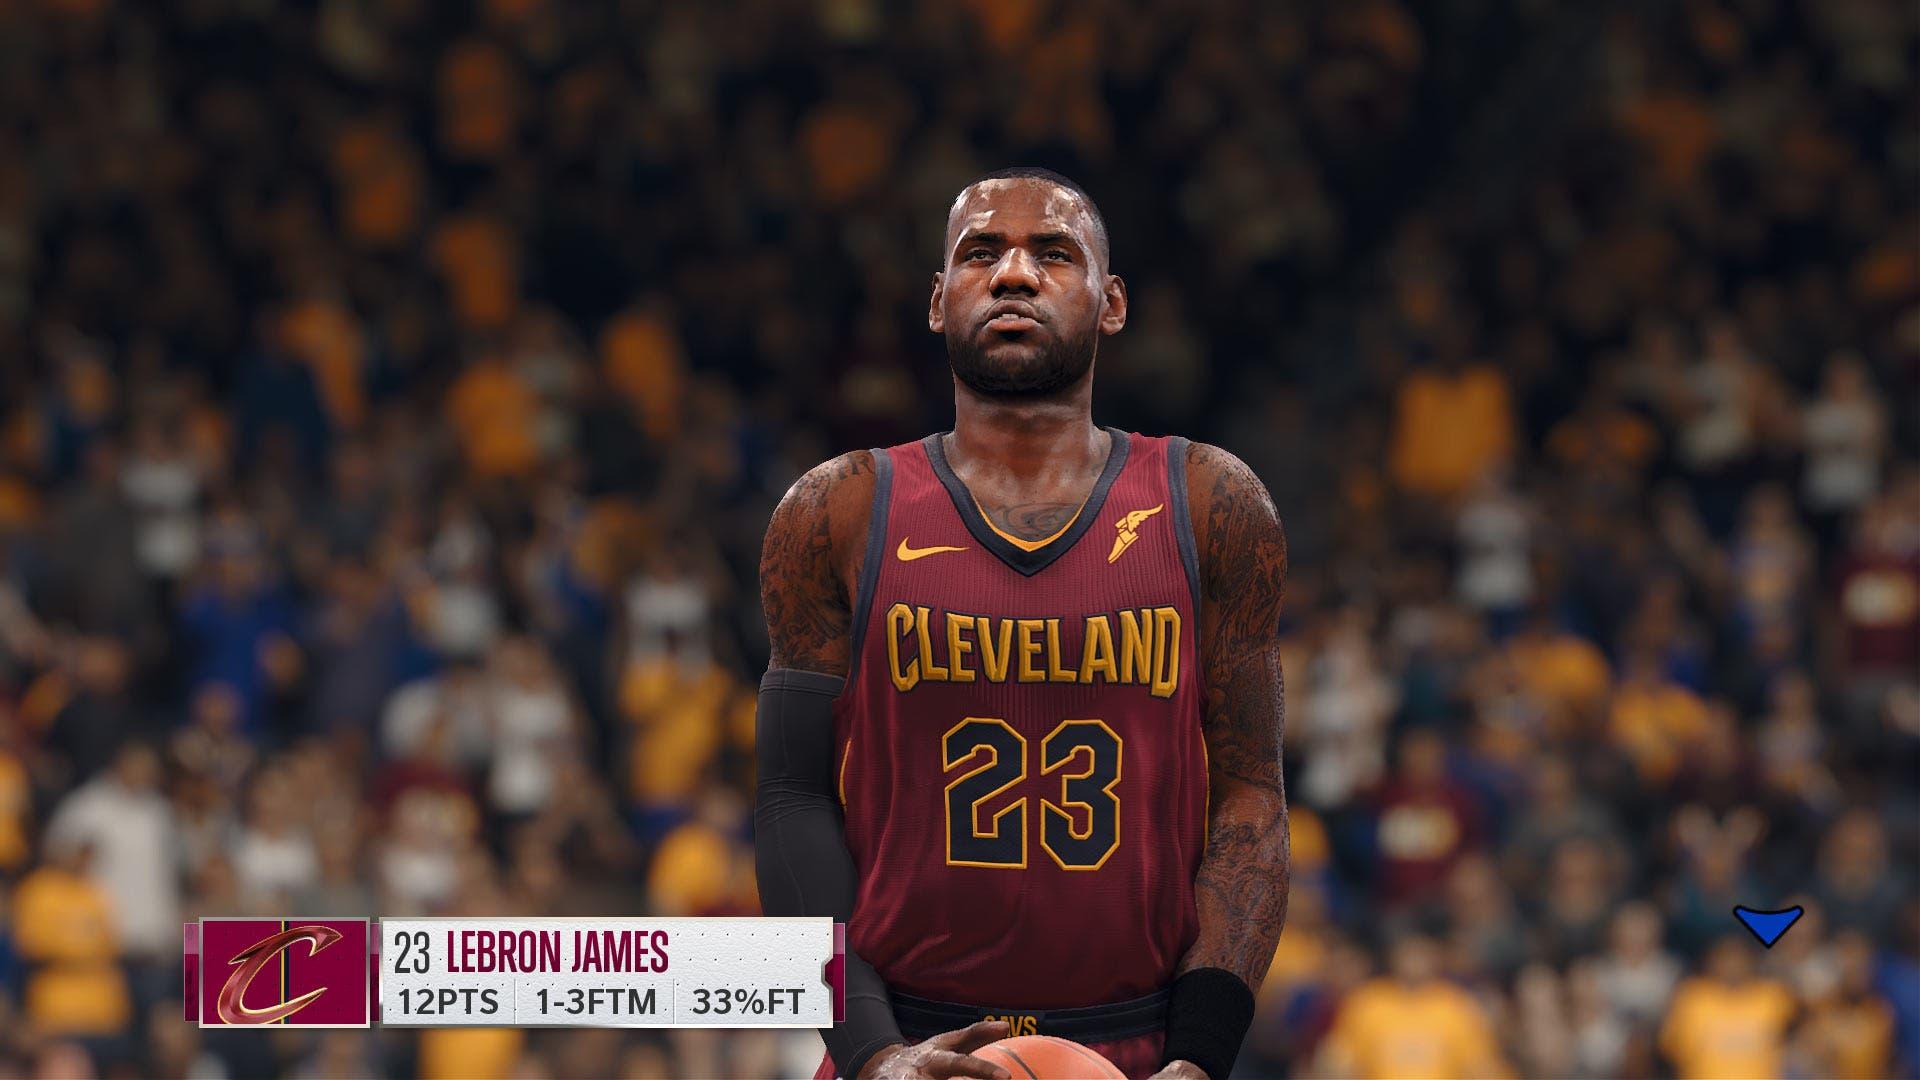 Análisis de NBA Live 18 - Xbox One 3